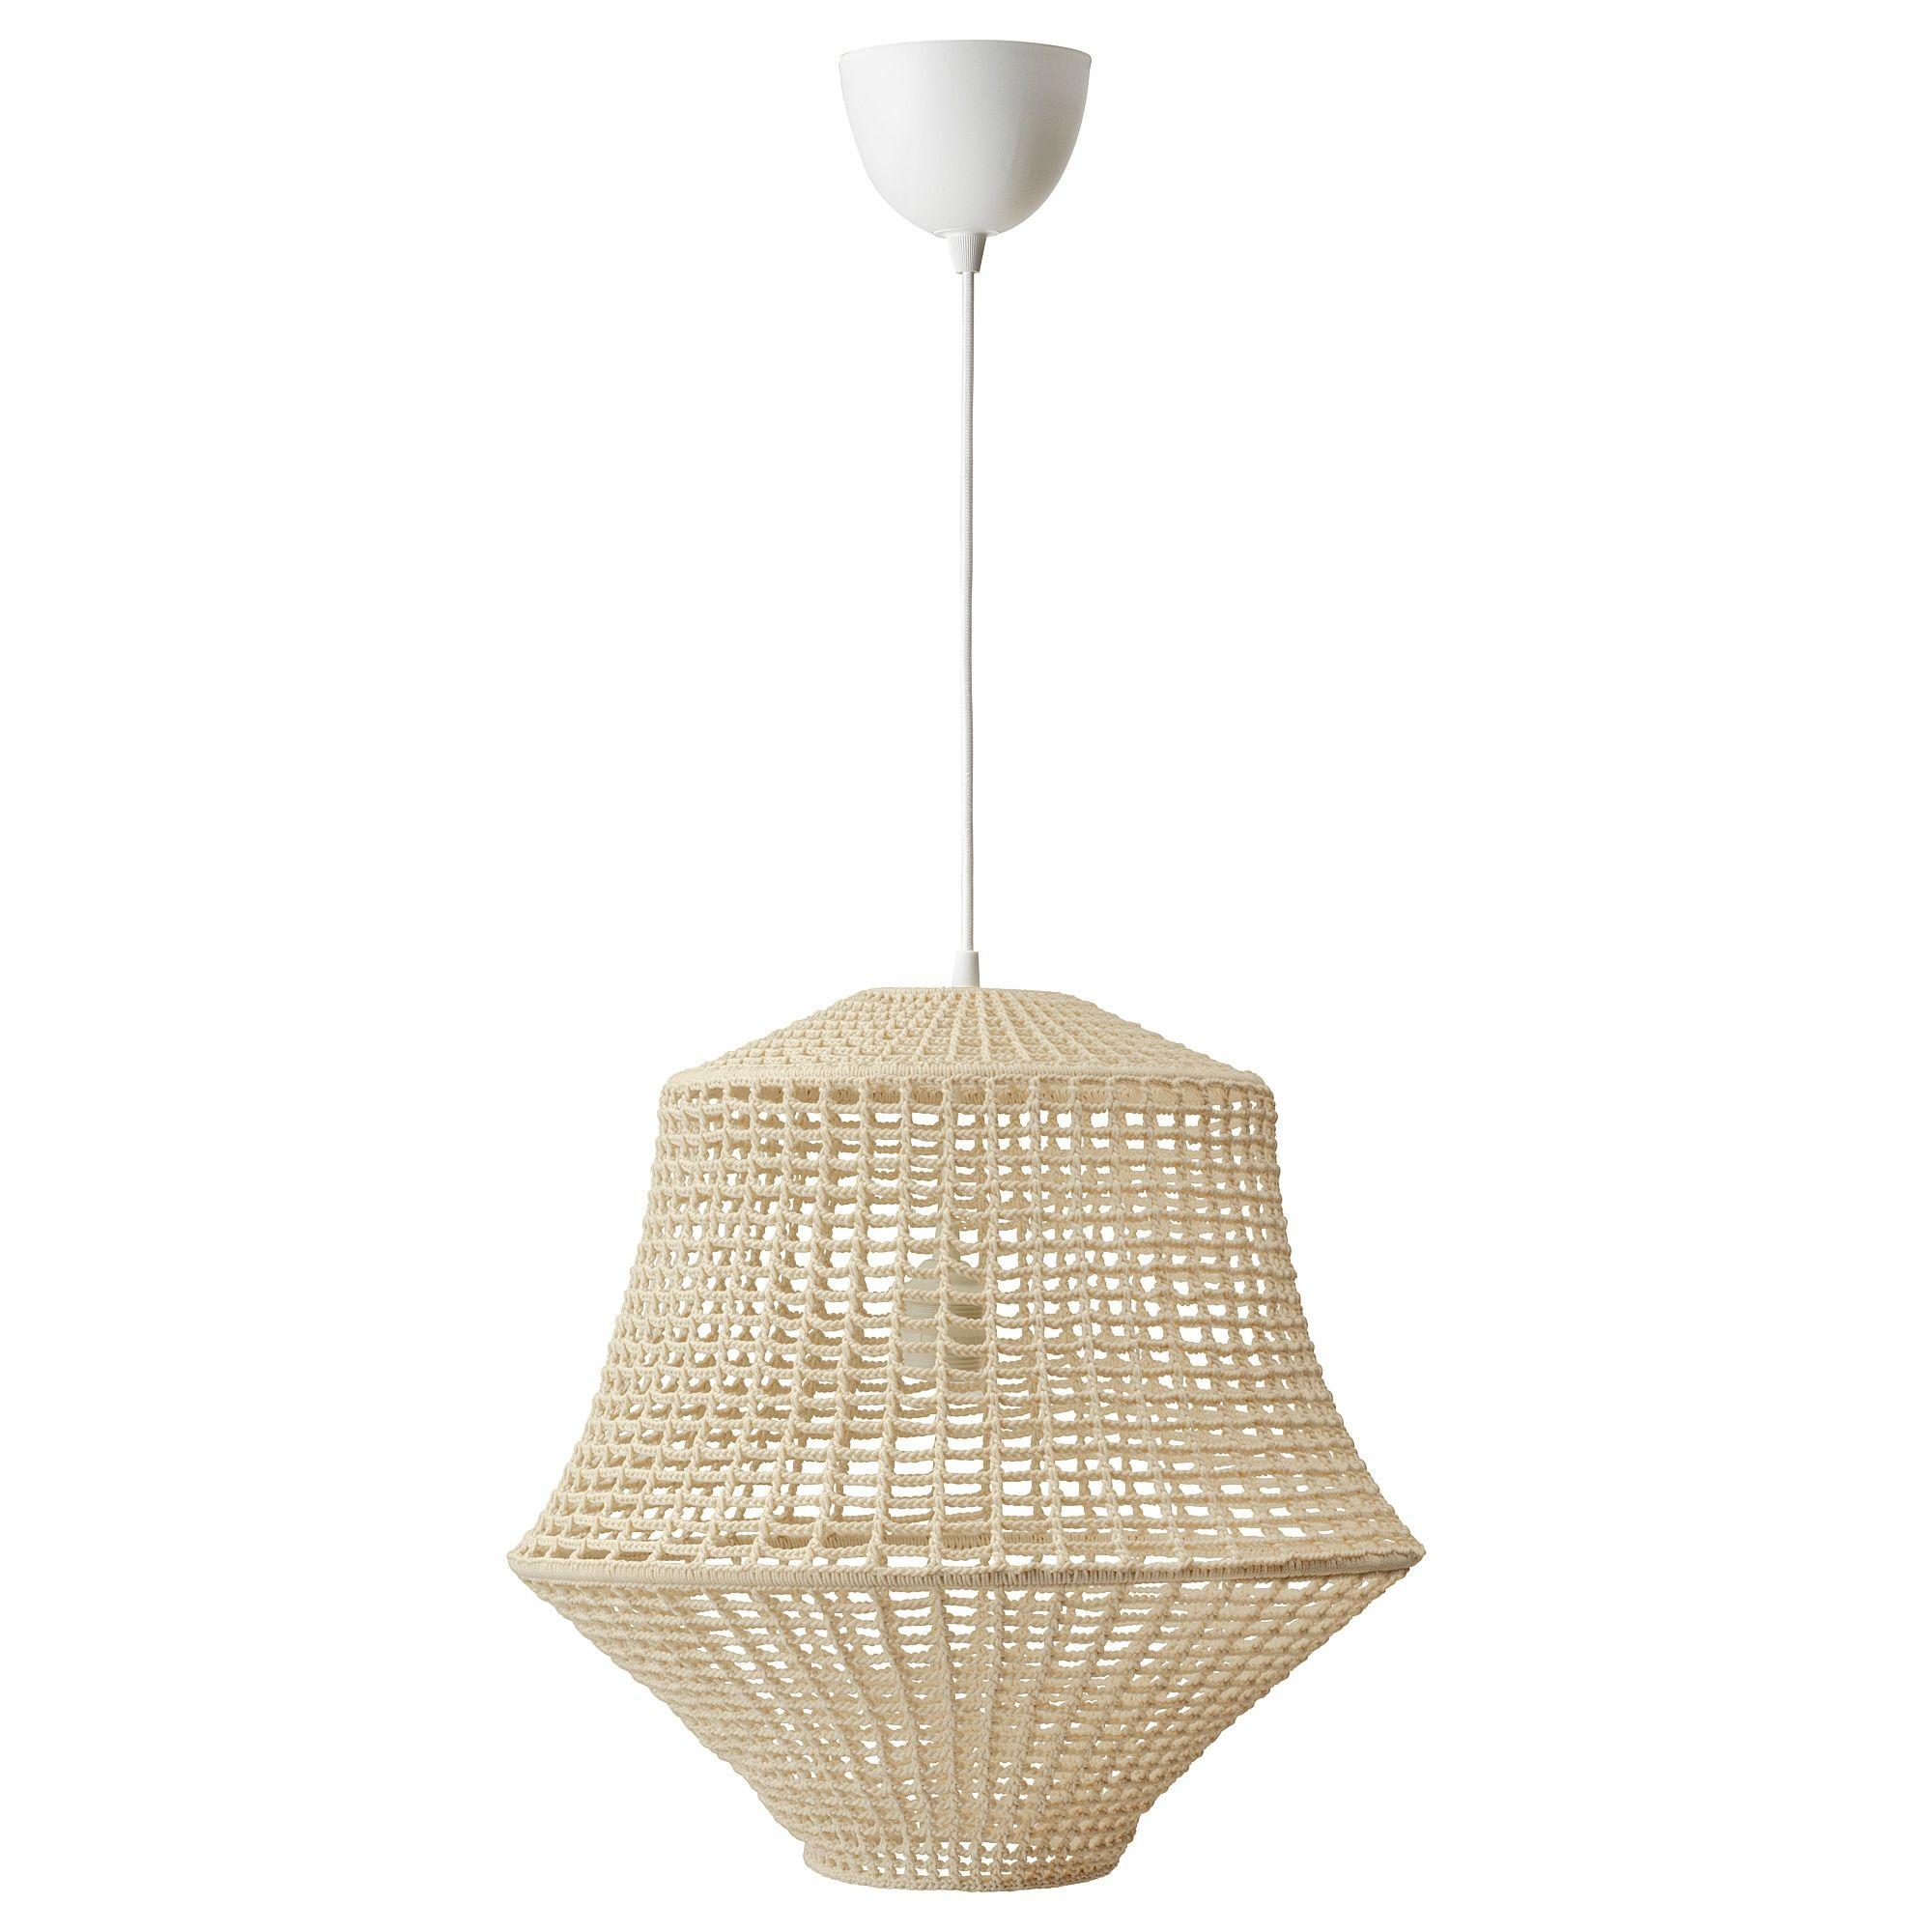 Ikea Us Furniture And Home Furnishings Pendant Lamp Pendant Lamp Shade Plug In Pendant Light